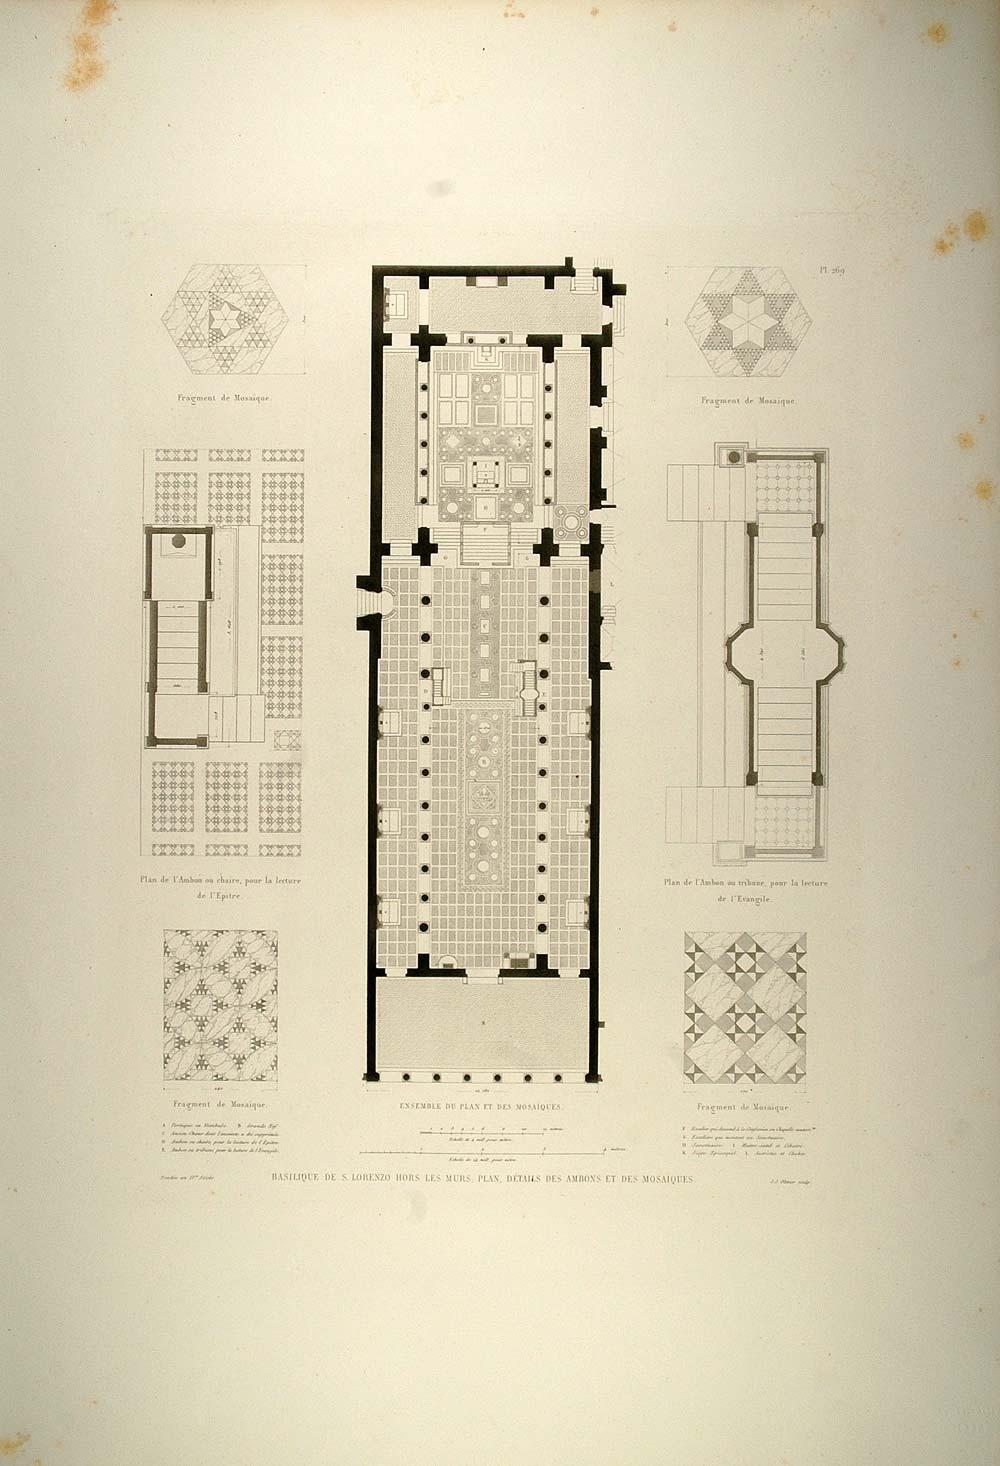 medium resolution of 1860 engraving basilica san lorenzo fuori le mura plan original rm1 period paper